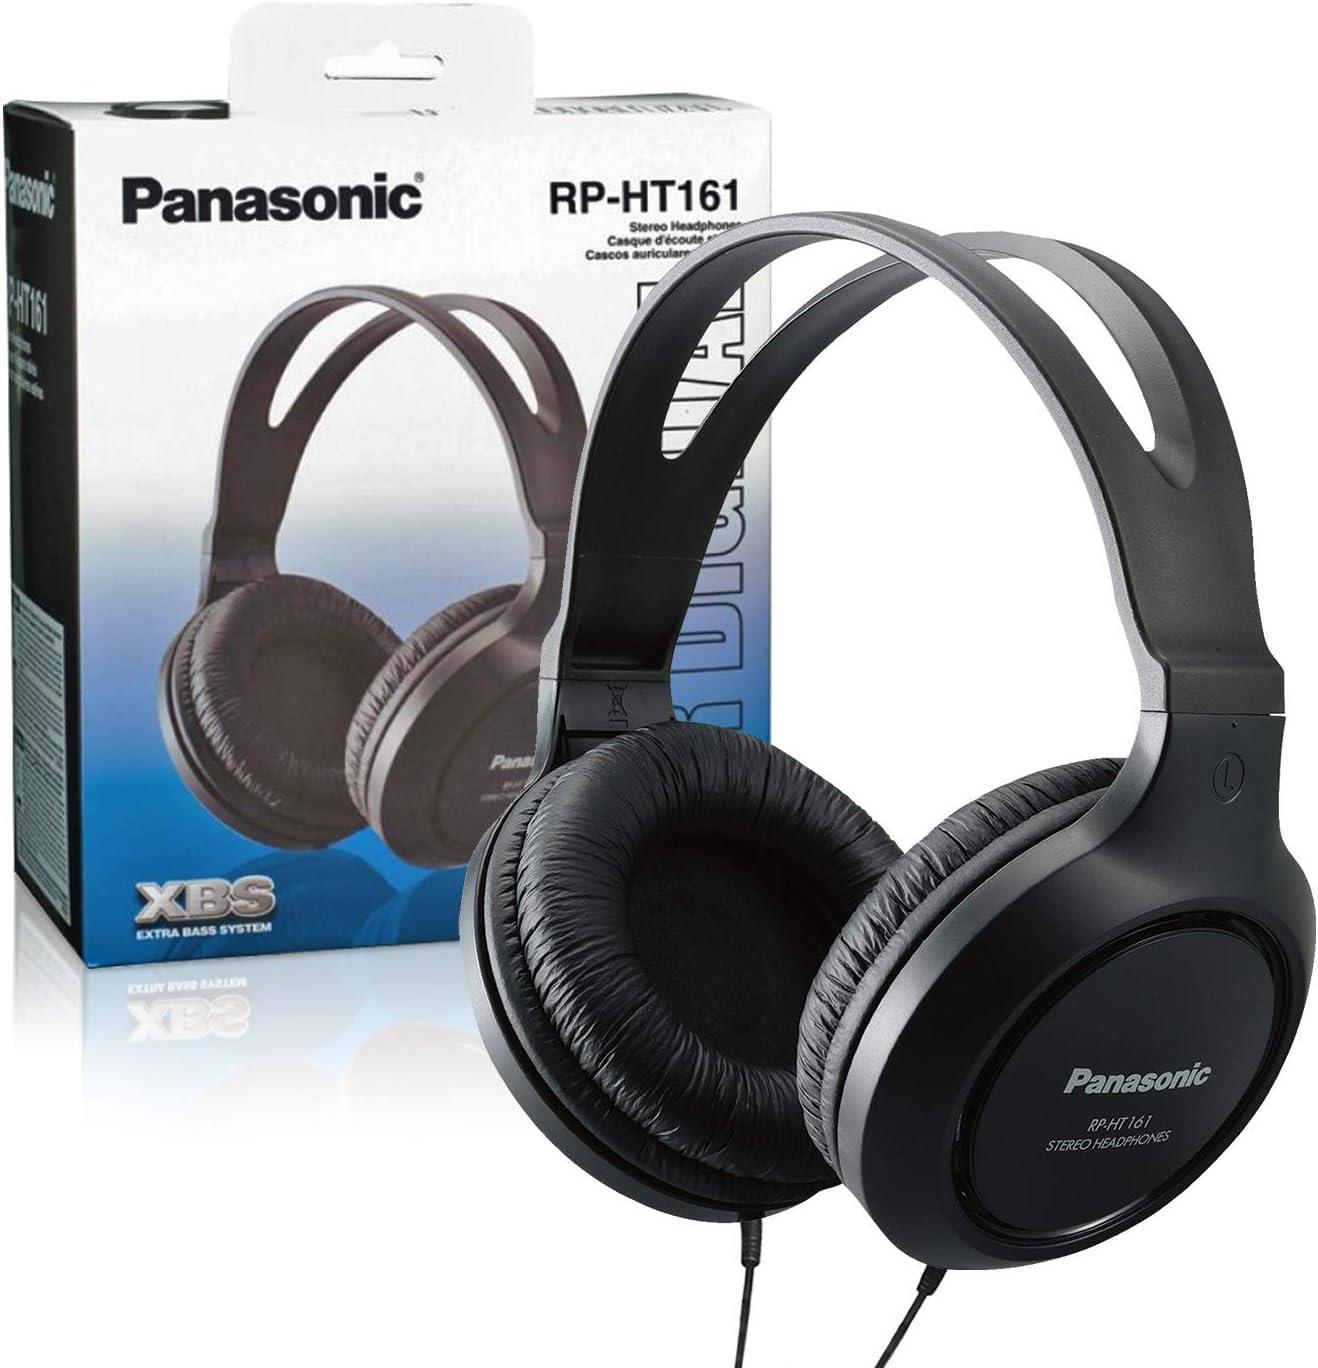 On-Ear Headphones Cell Phones & Accessories Panasonic Headphones